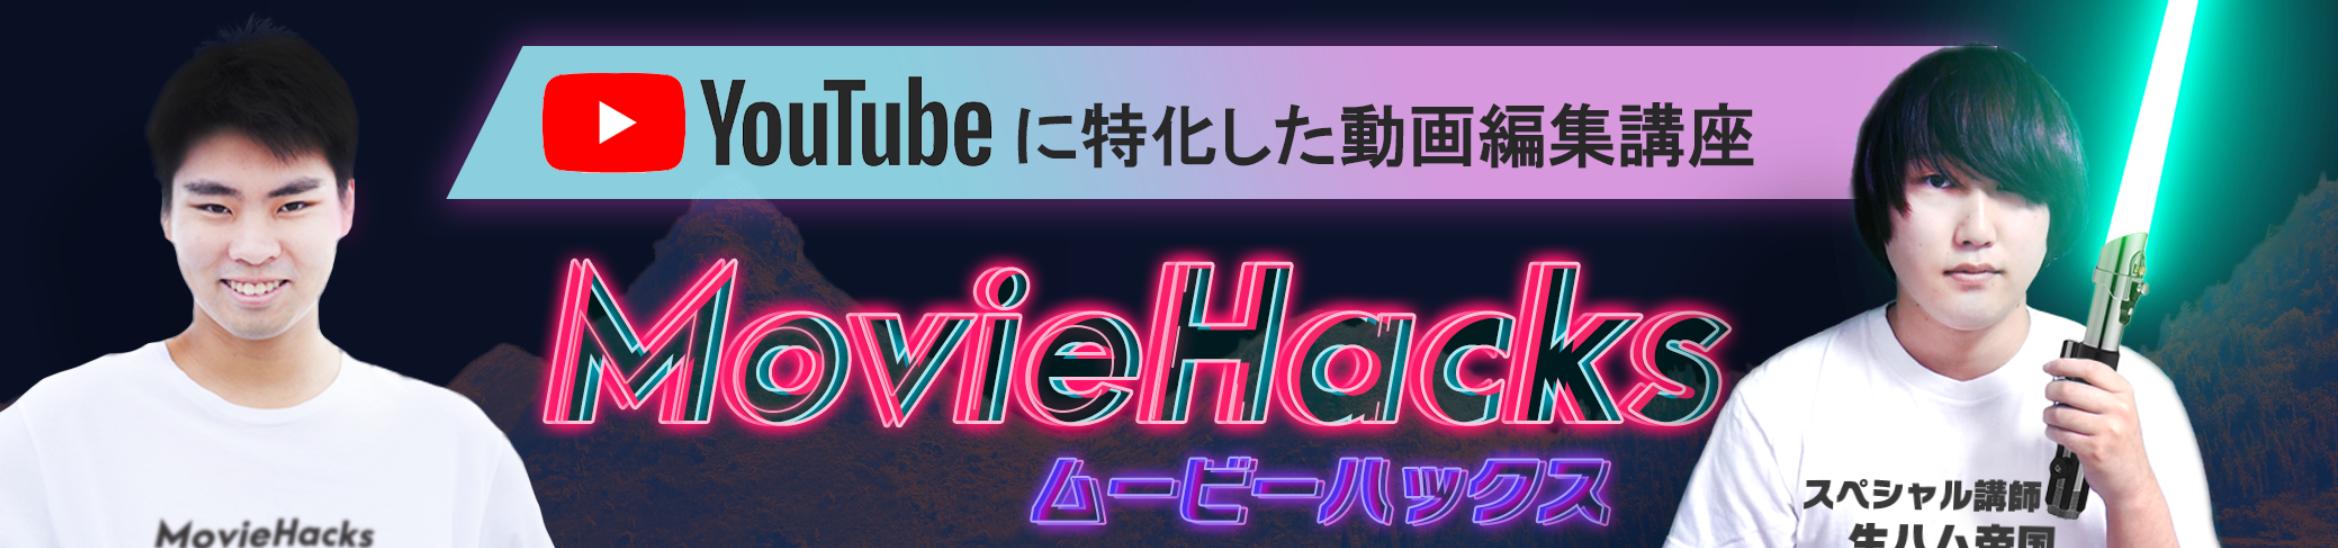 Movie Hacksヘッダー画像